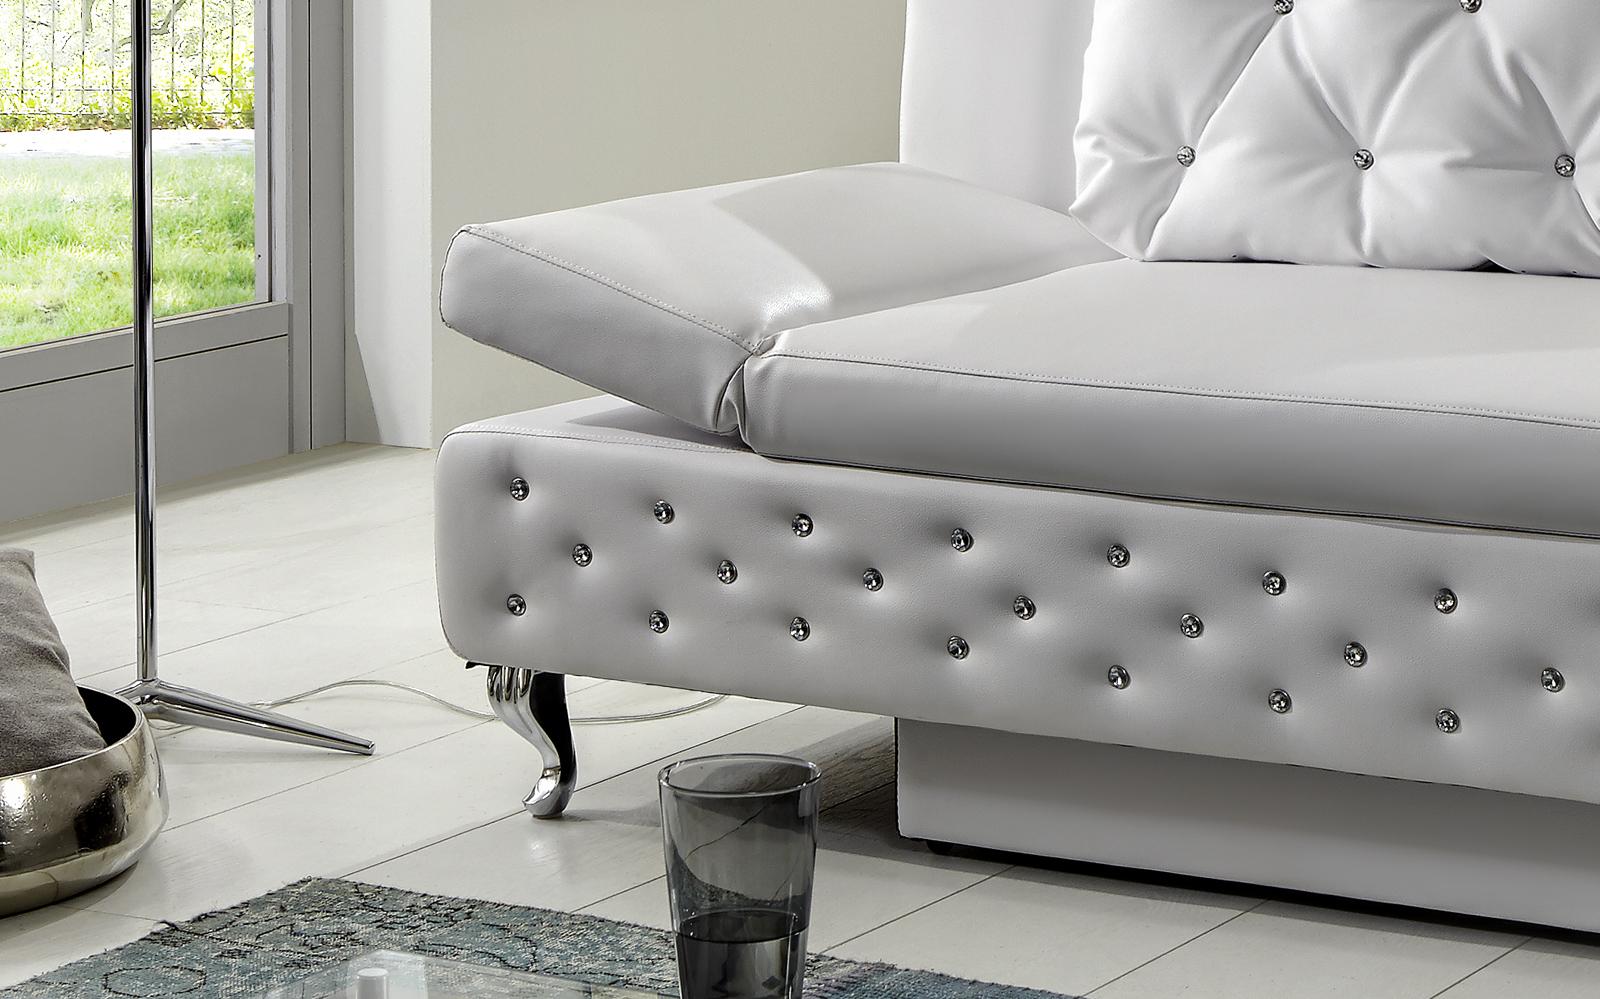 sam schlafsofa wei sofa roxy 200 cm auf lager. Black Bedroom Furniture Sets. Home Design Ideas